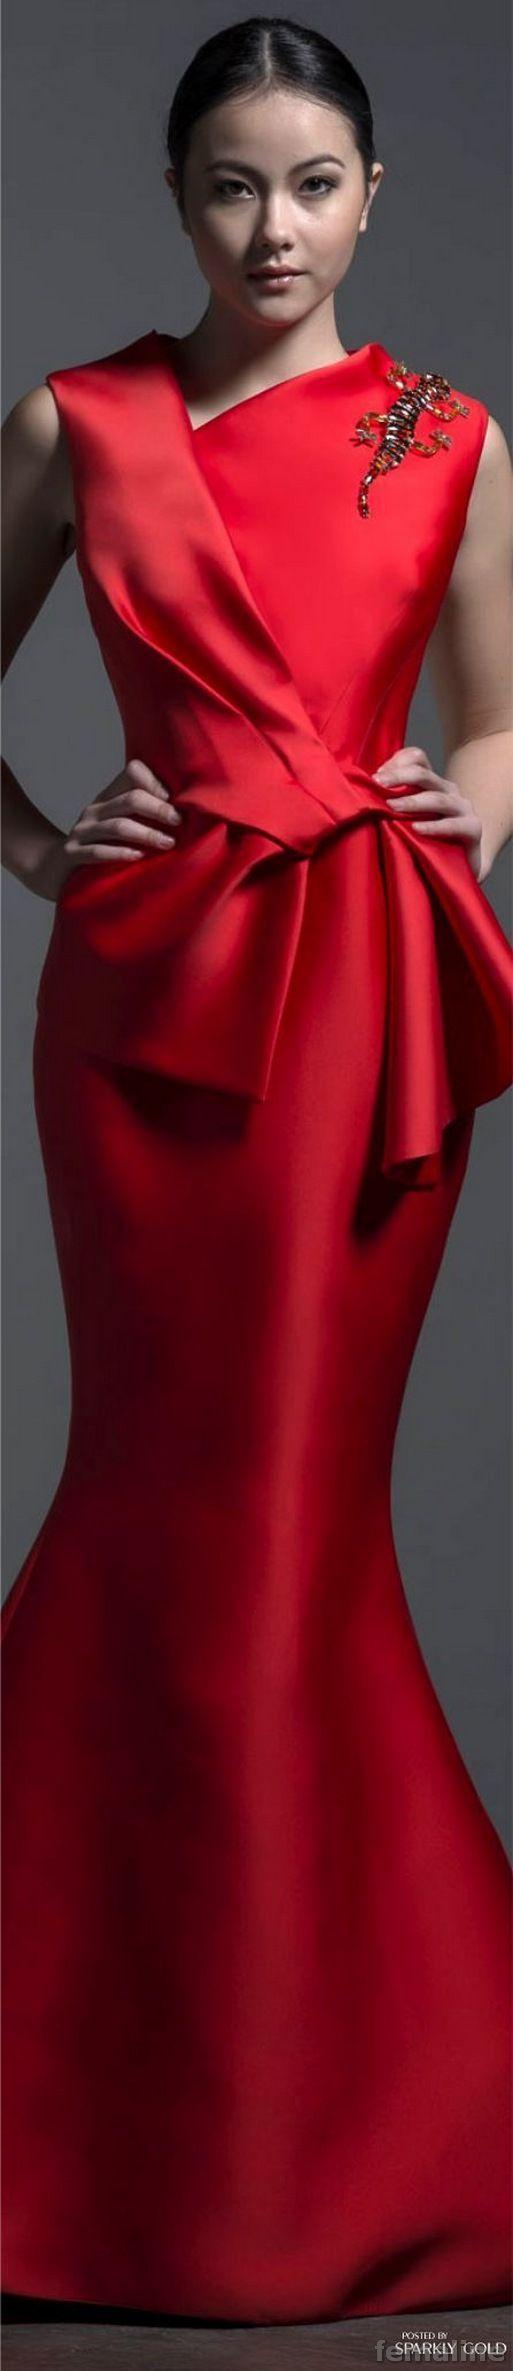 Elegant Red Dresses